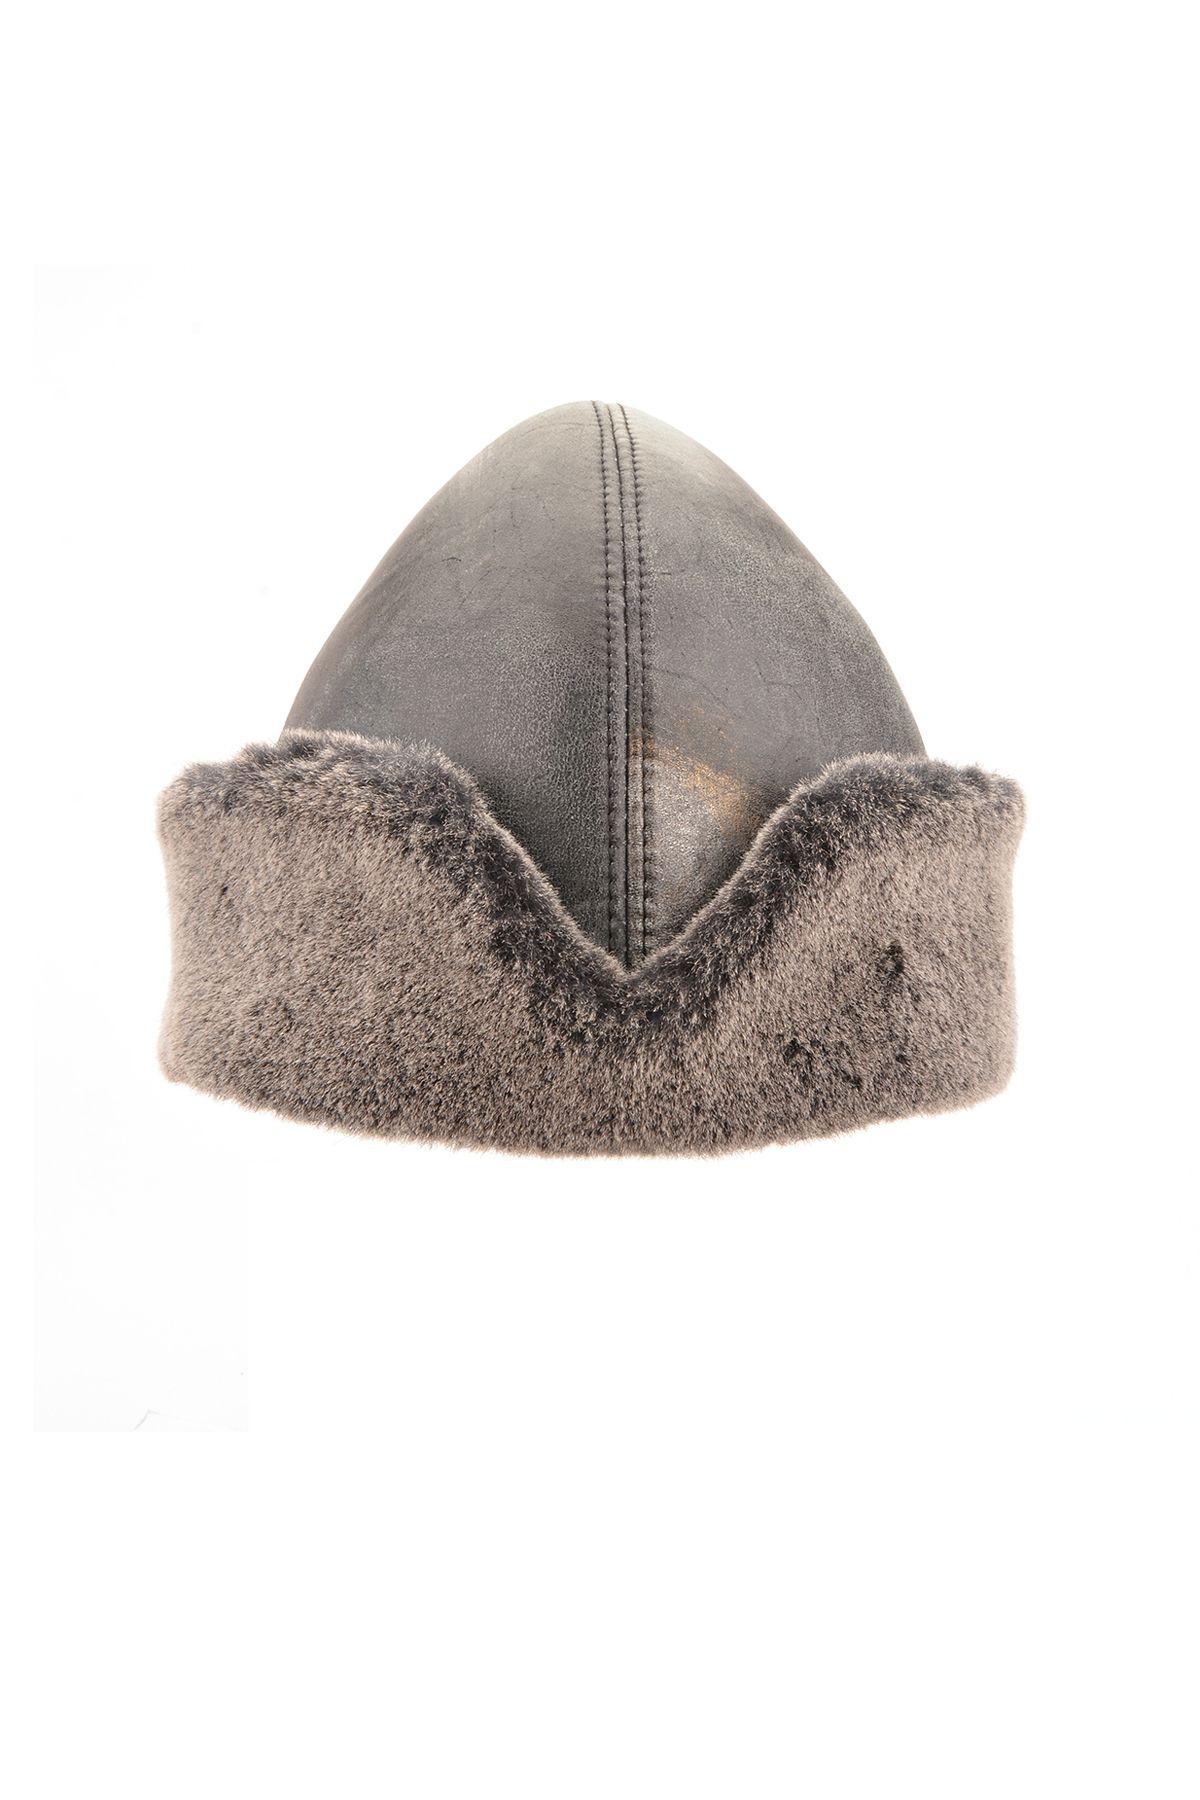 Pegia Hakiki Vintage Deri Kürklü Diriliş Şapka 18AS09 Gri